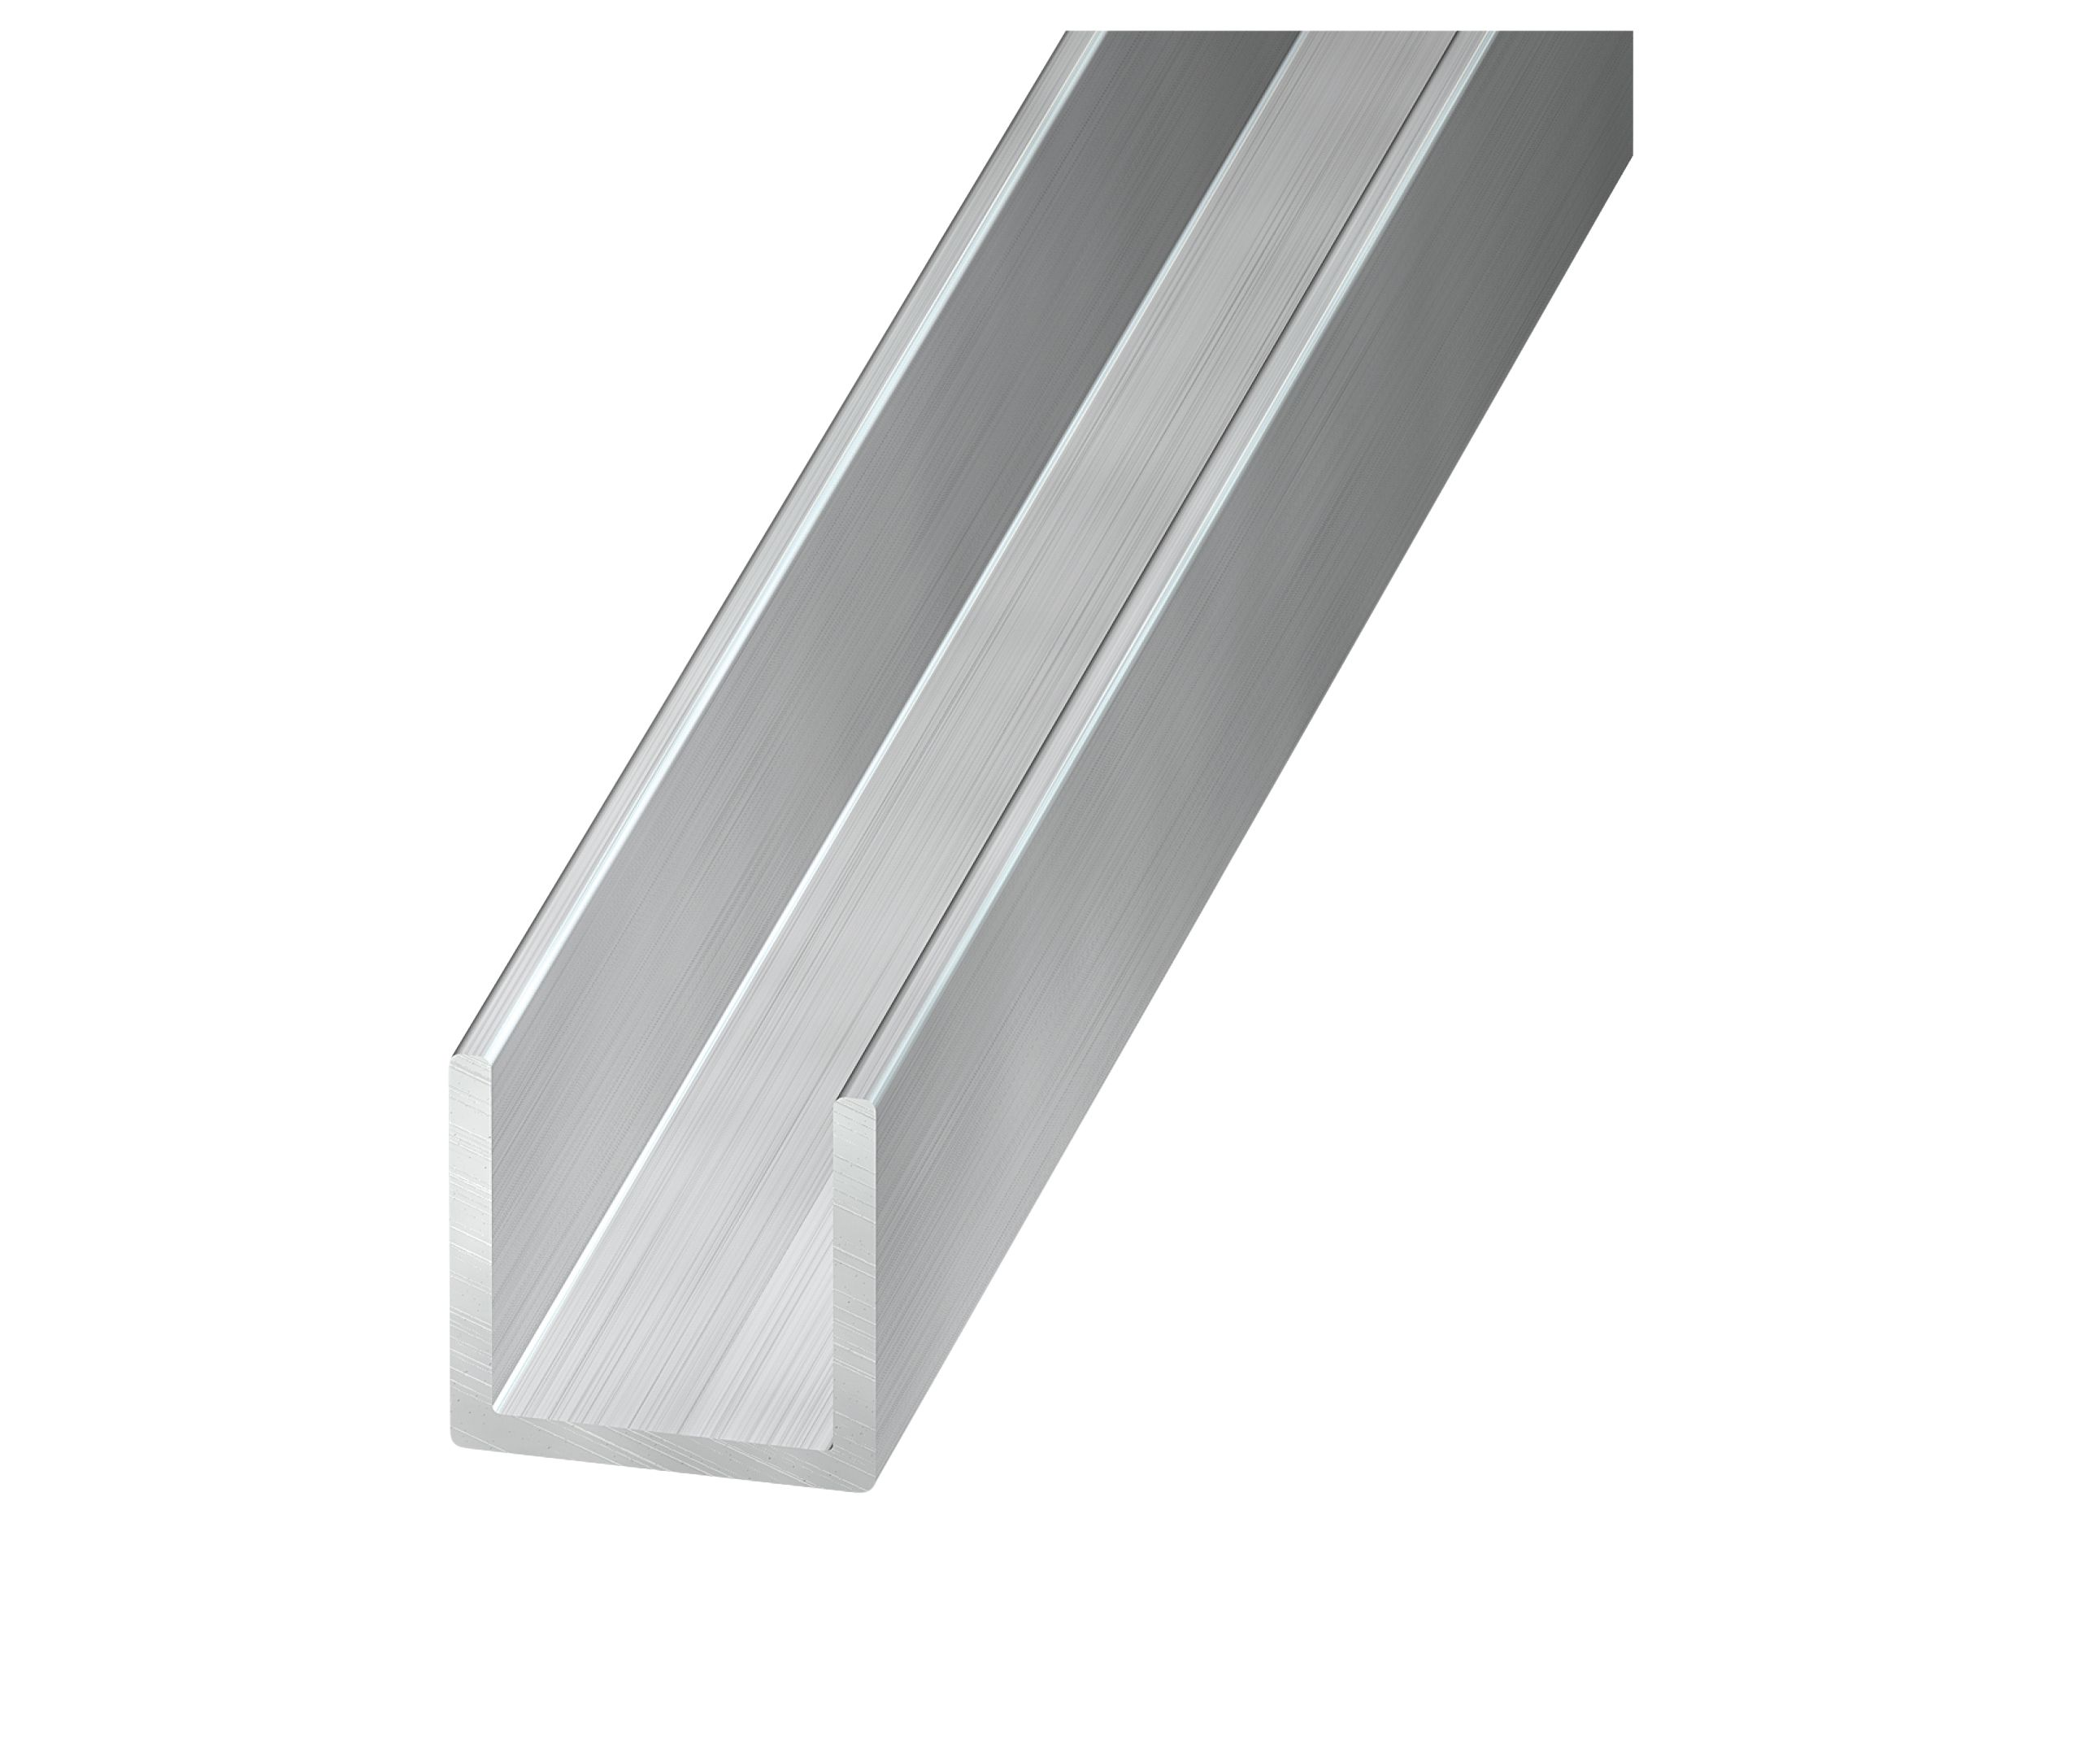 aluminium u profile h 6mm w 6mm l 1m departments. Black Bedroom Furniture Sets. Home Design Ideas